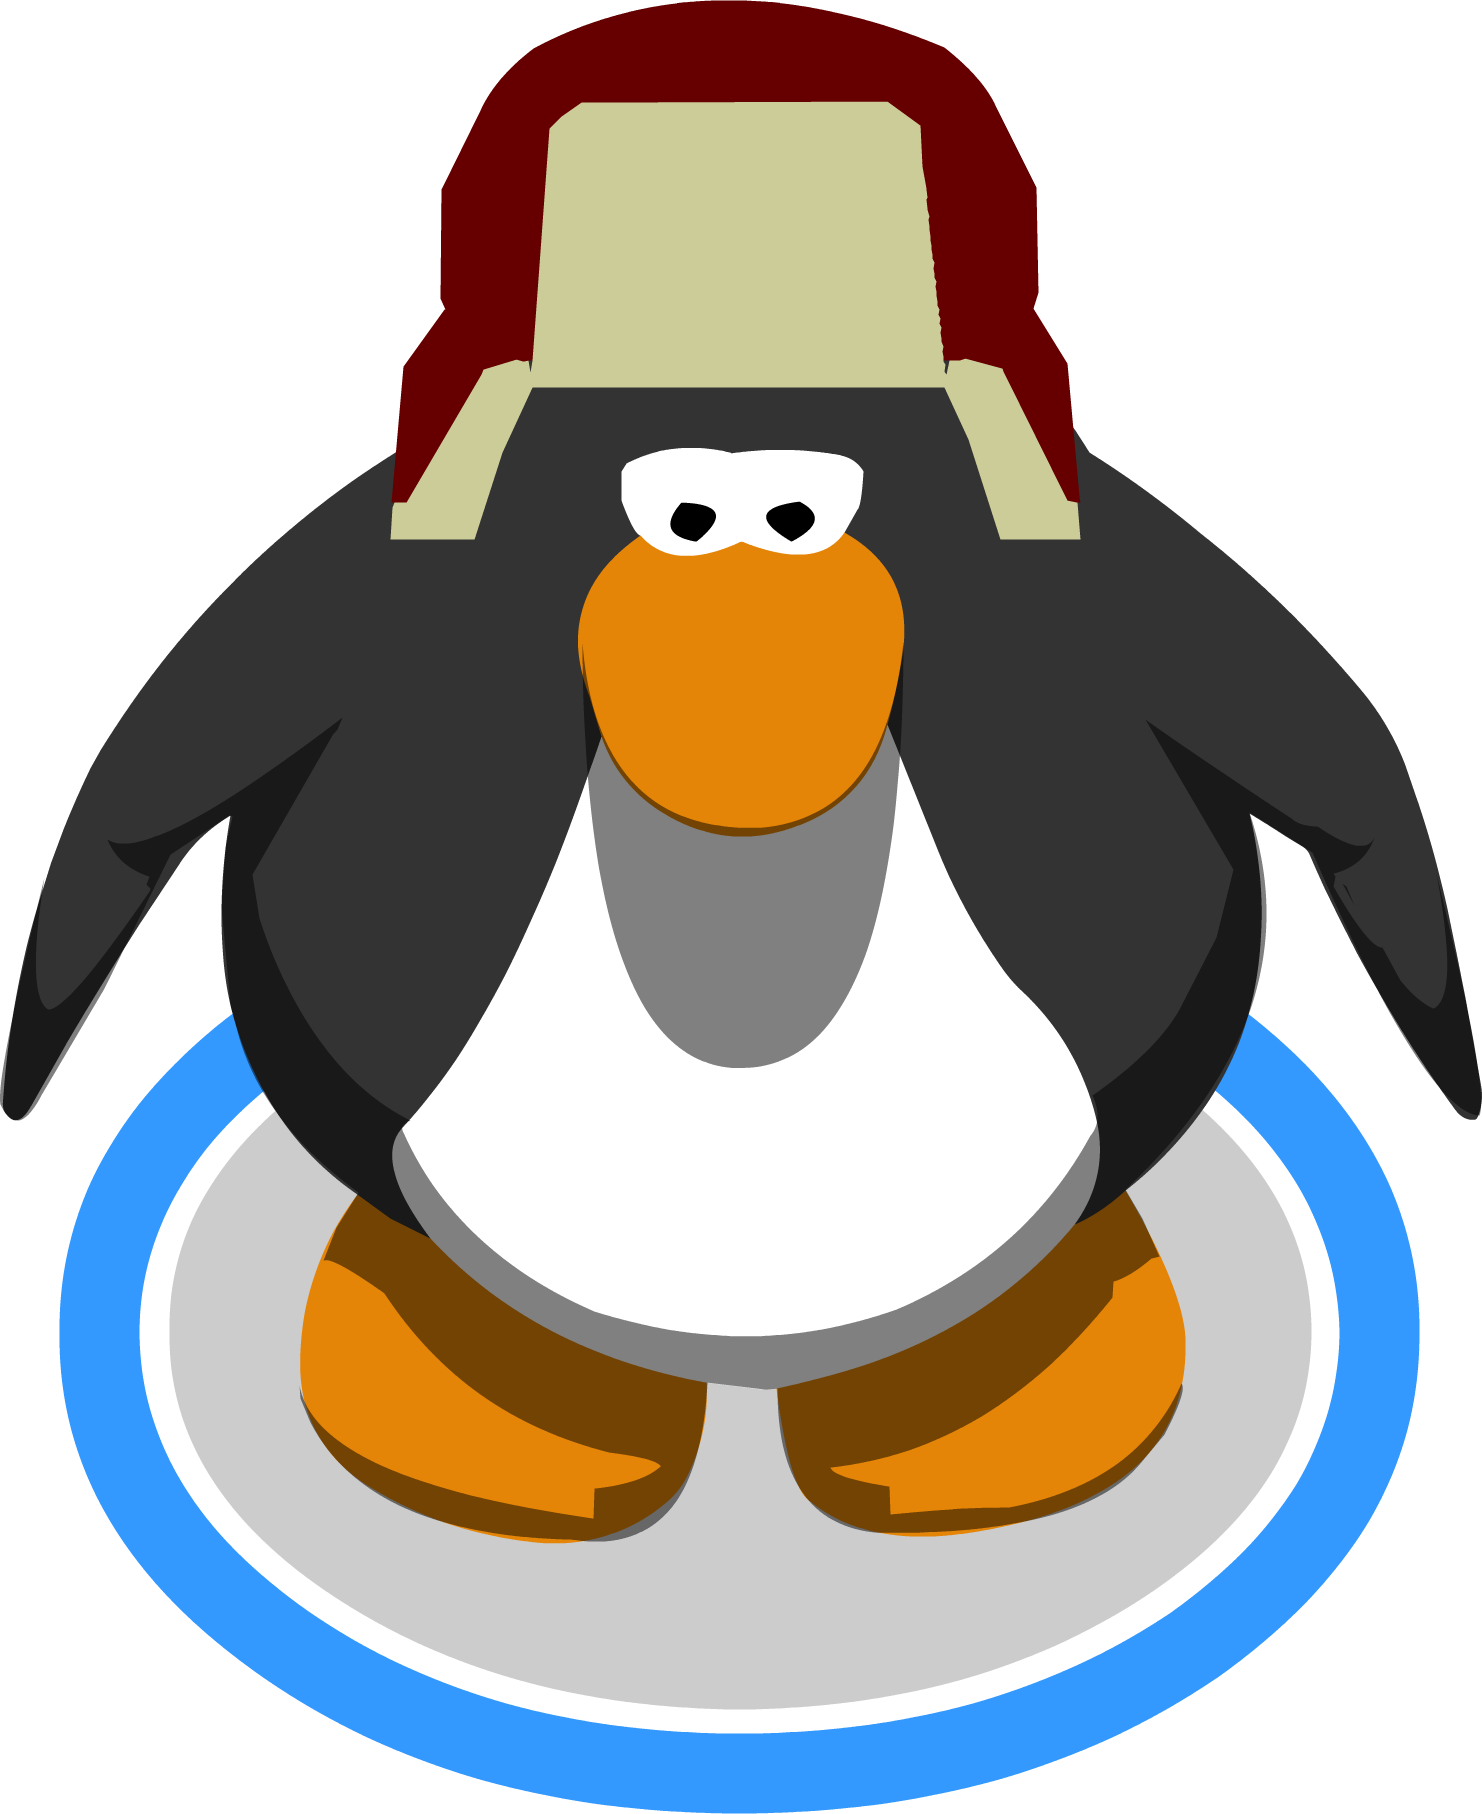 Clipart penguin chilly. Image trek hat ingame